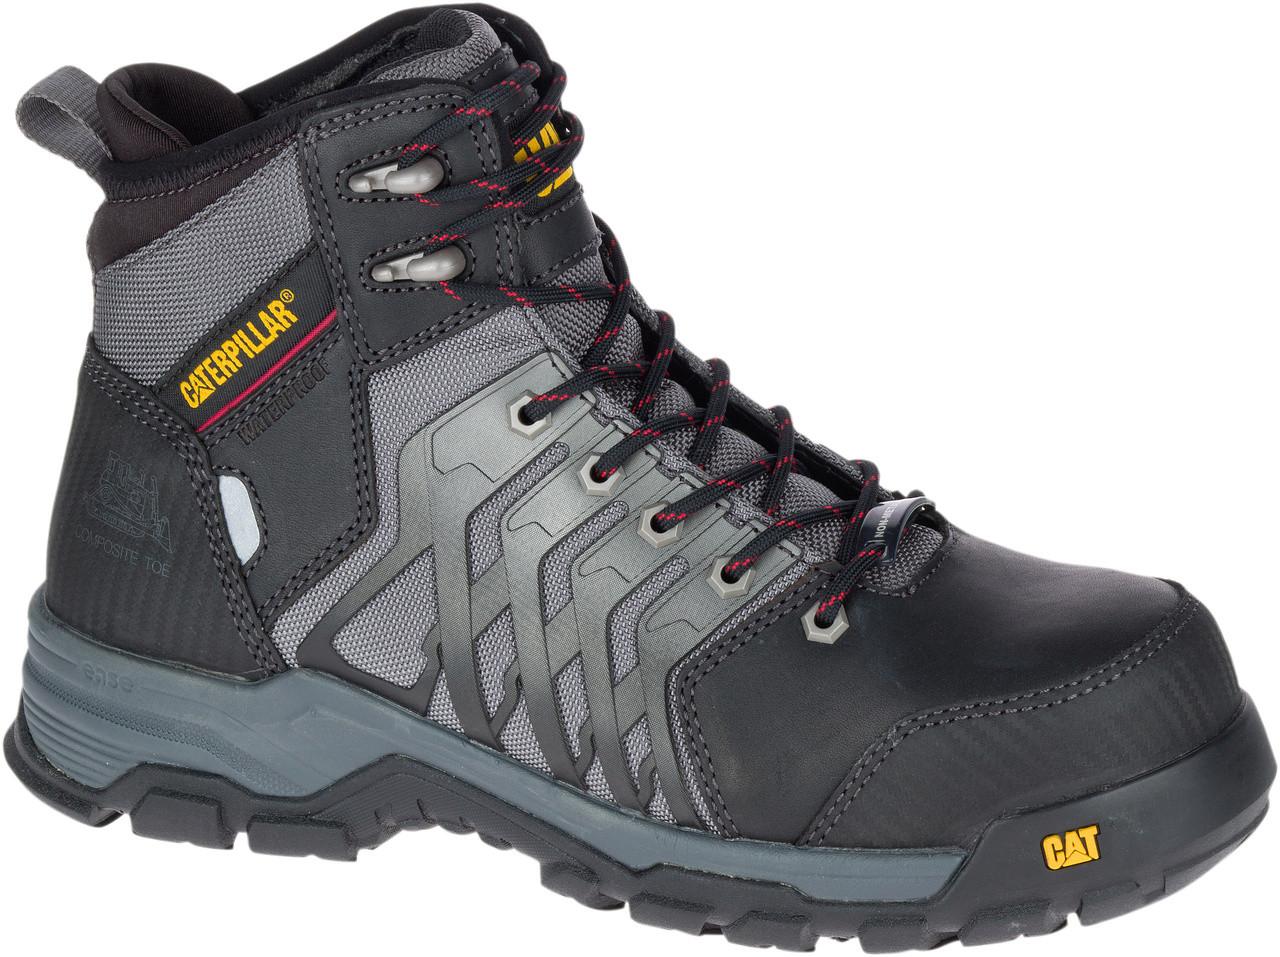 2f06d7e7647 Cat Men's Induction Waterproof Nano Toe Work Boot - Black